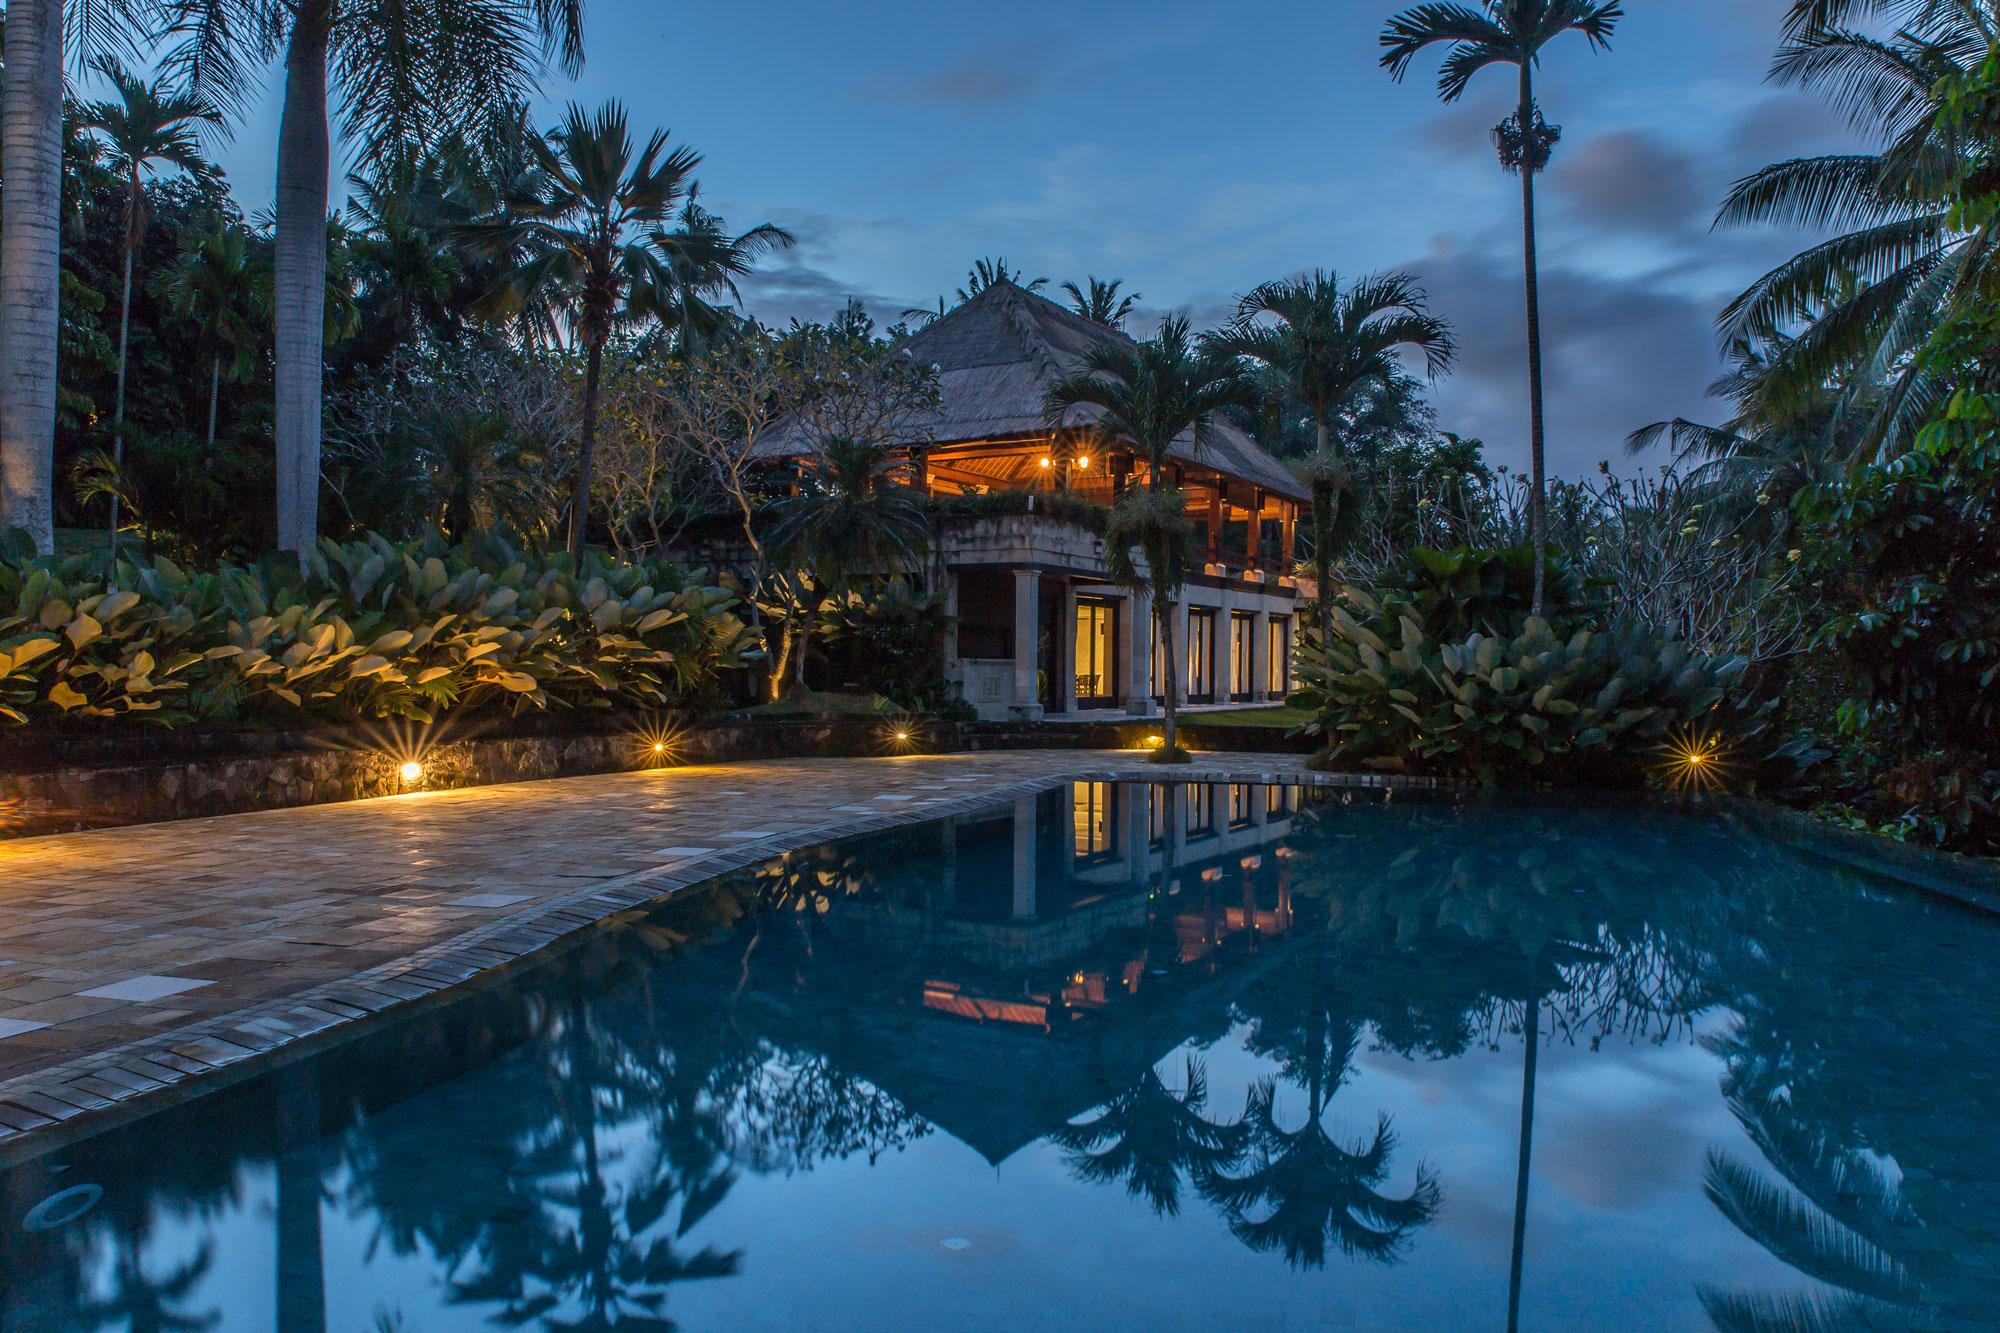 Bali-Purnati-1-10.jpg